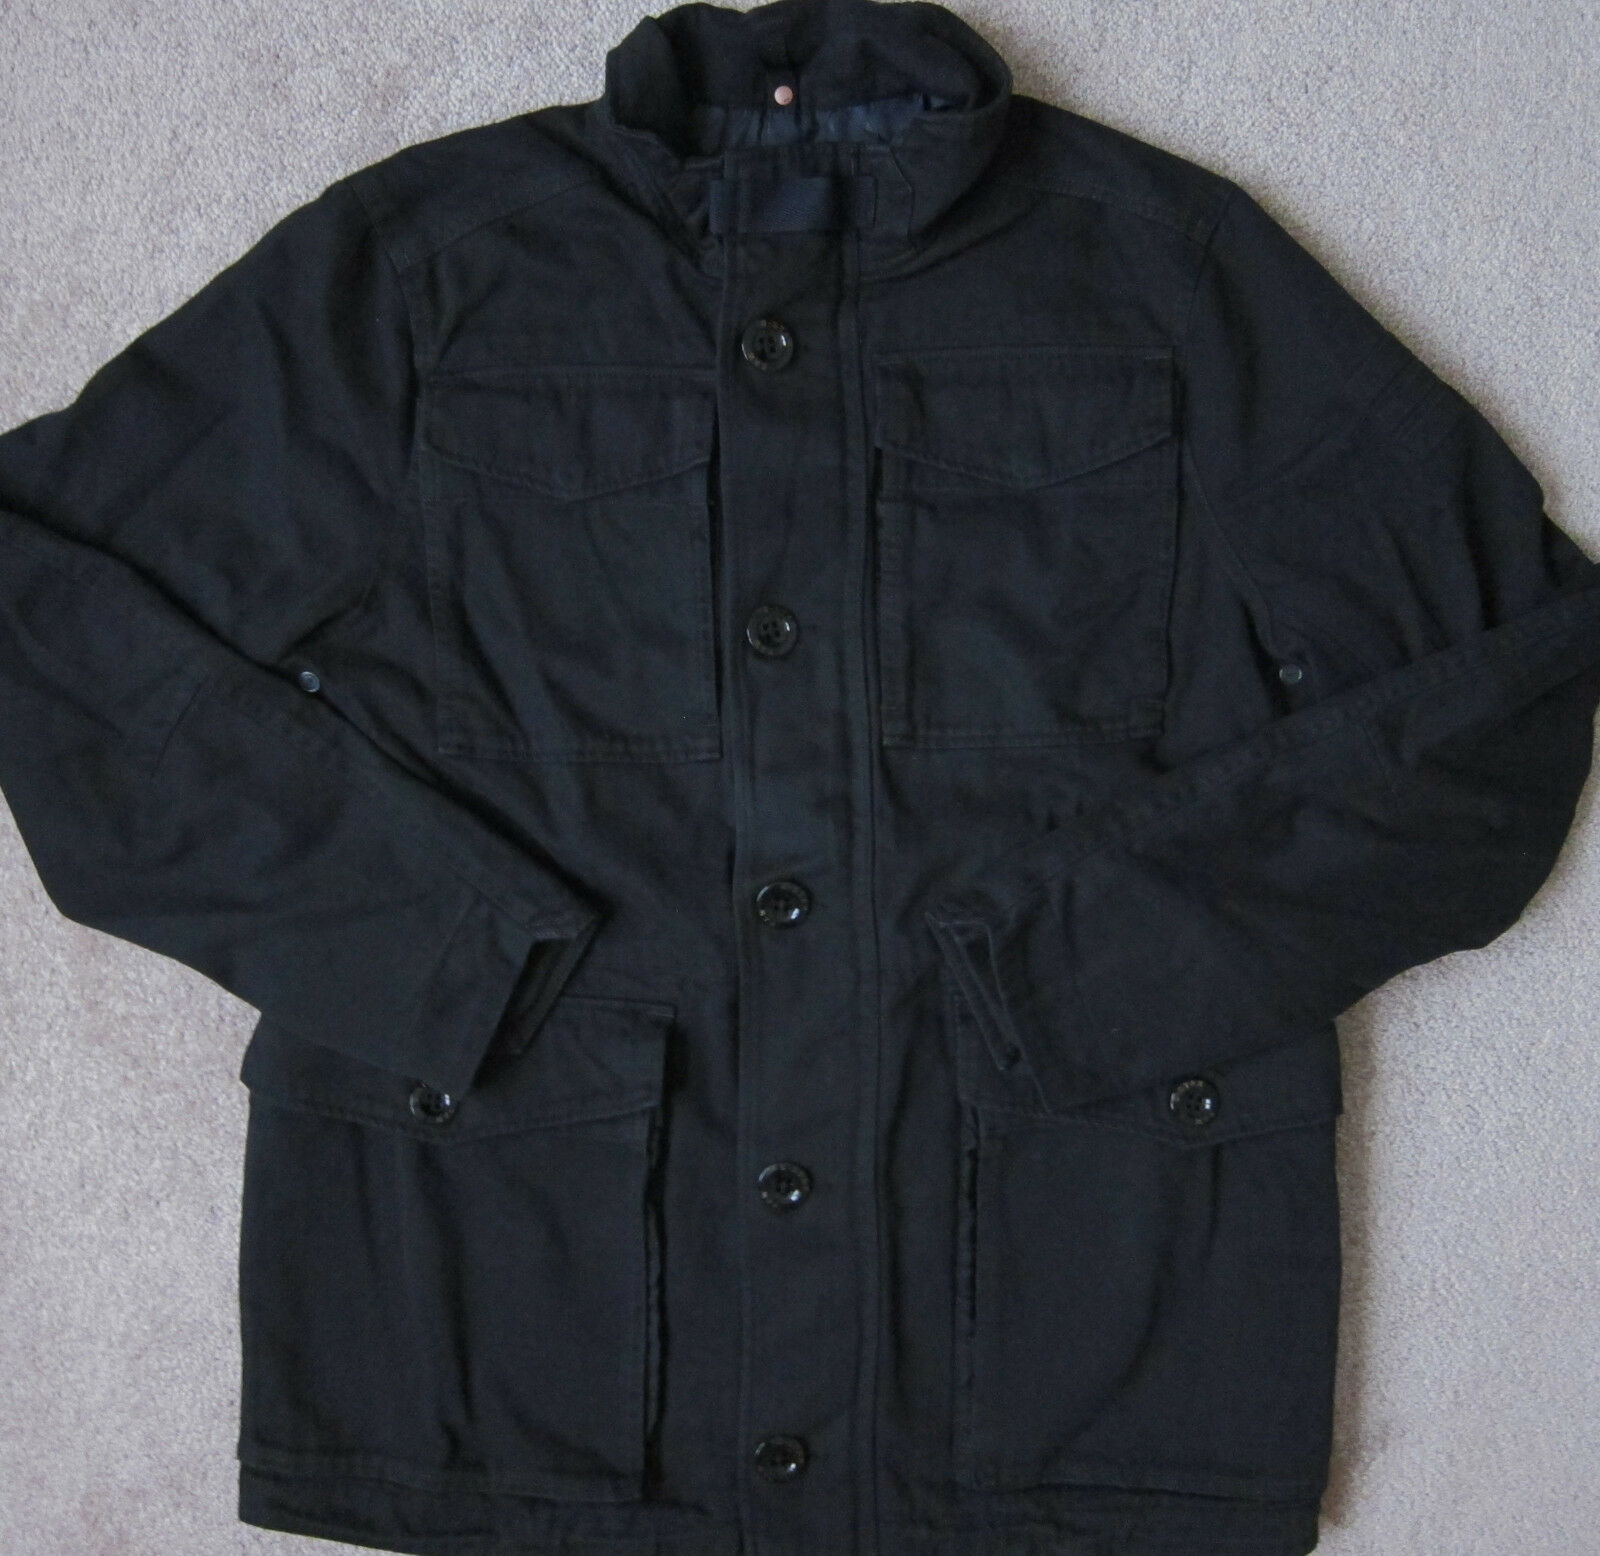 G-STAR RAW (Fekete) MFD Pamut Field Jacket w / Bélés férfiak - NWT